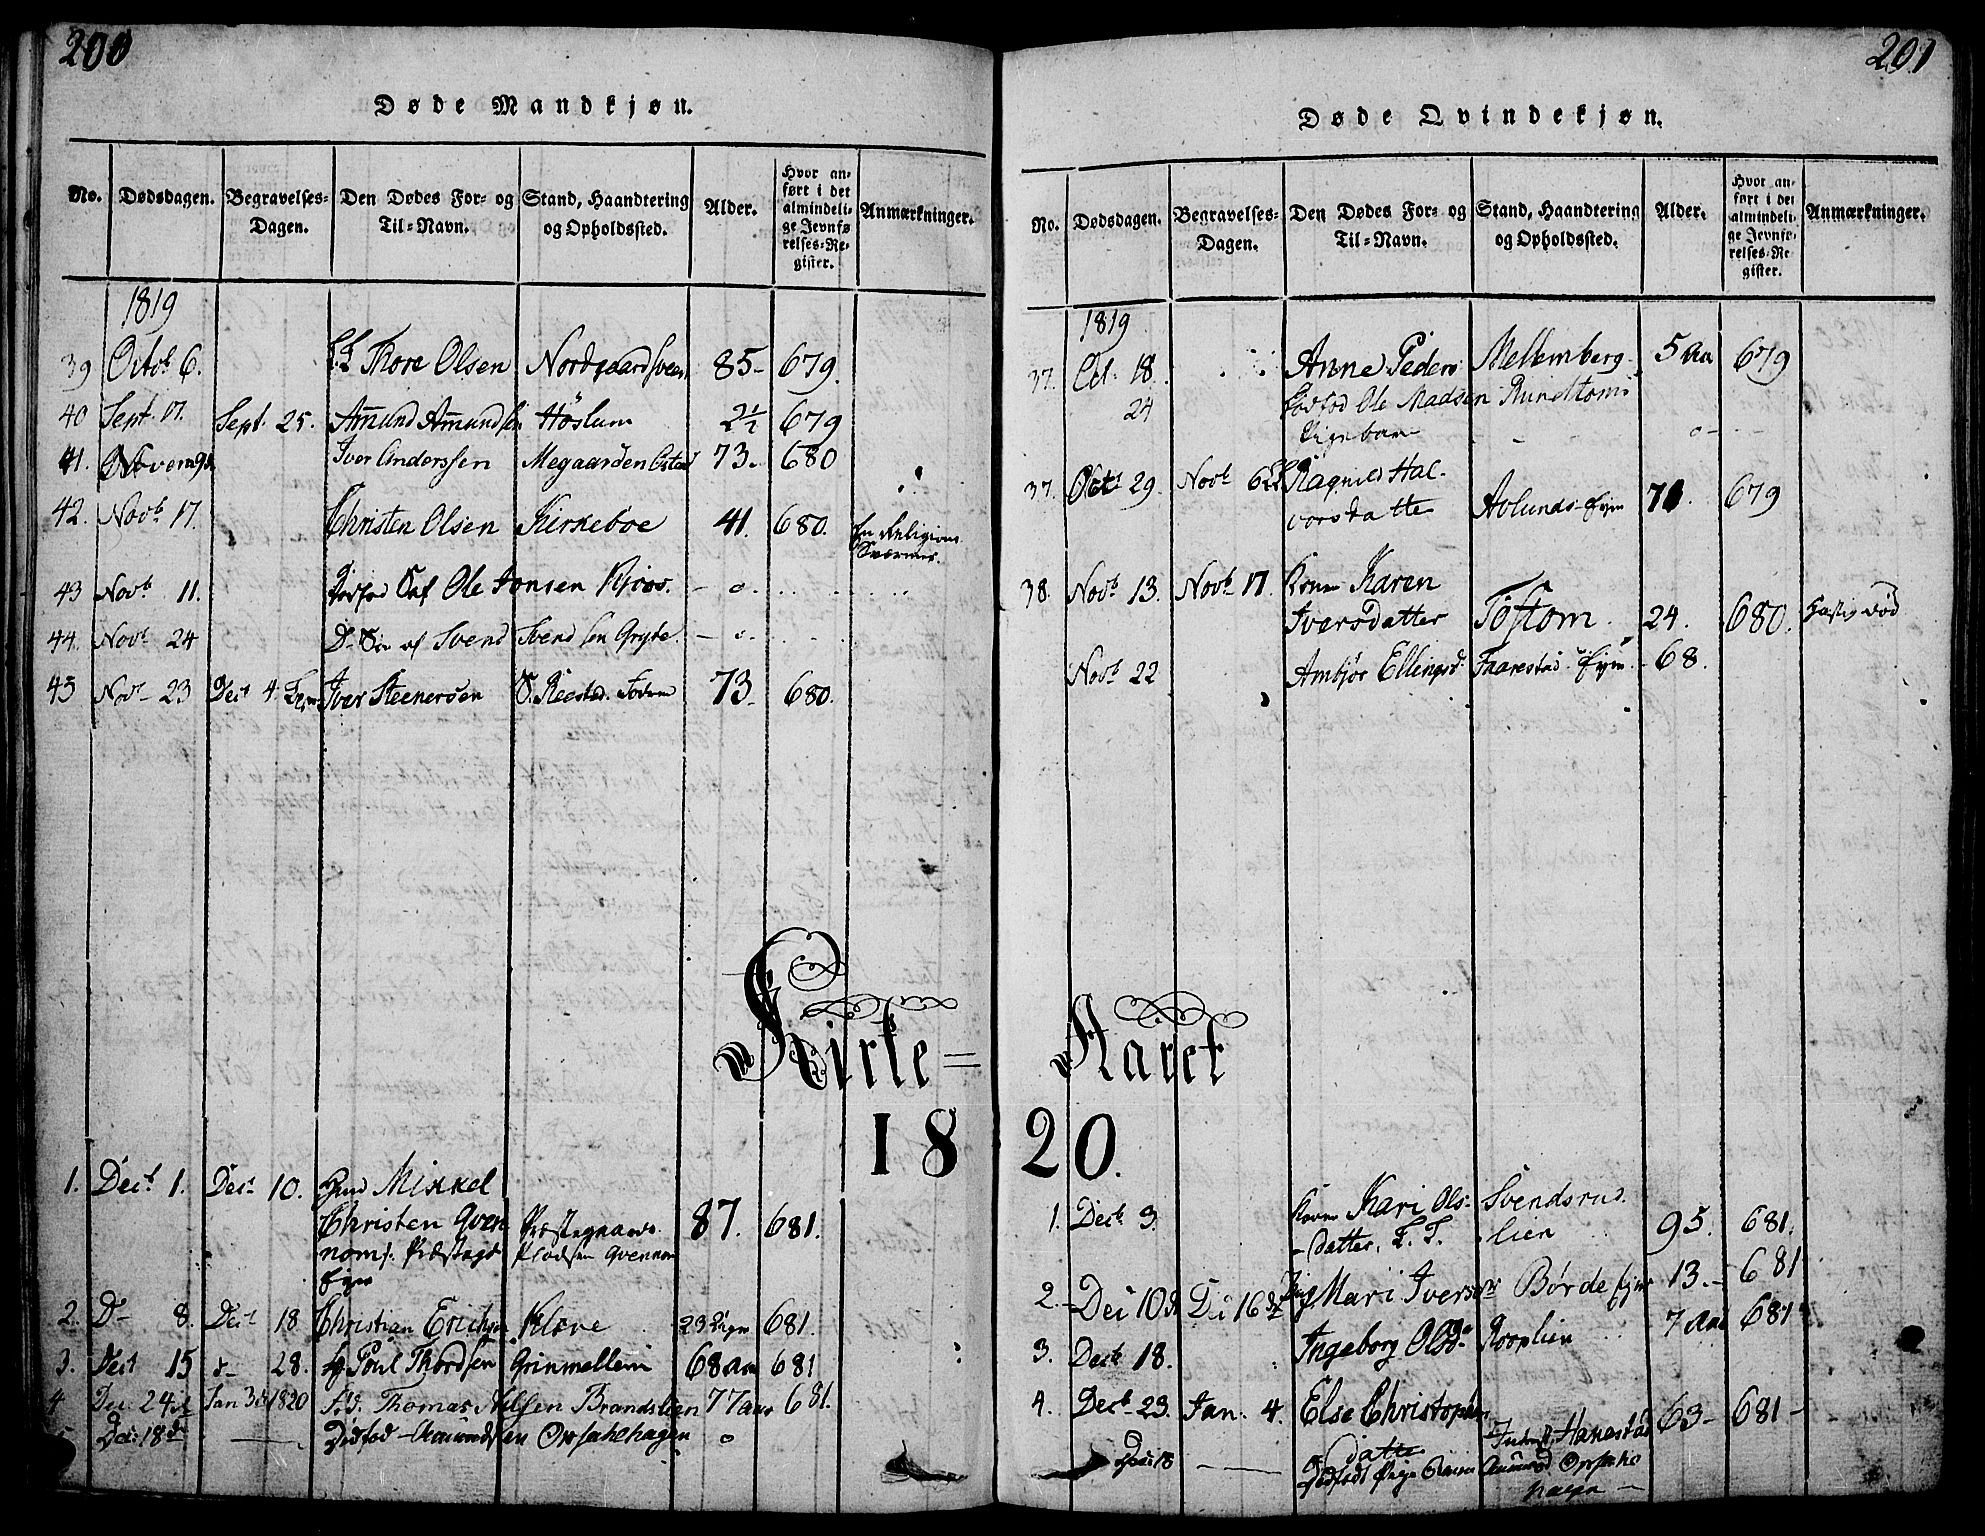 SAH, Gausdal prestekontor, Ministerialbok nr. 5, 1817-1829, s. 200-201